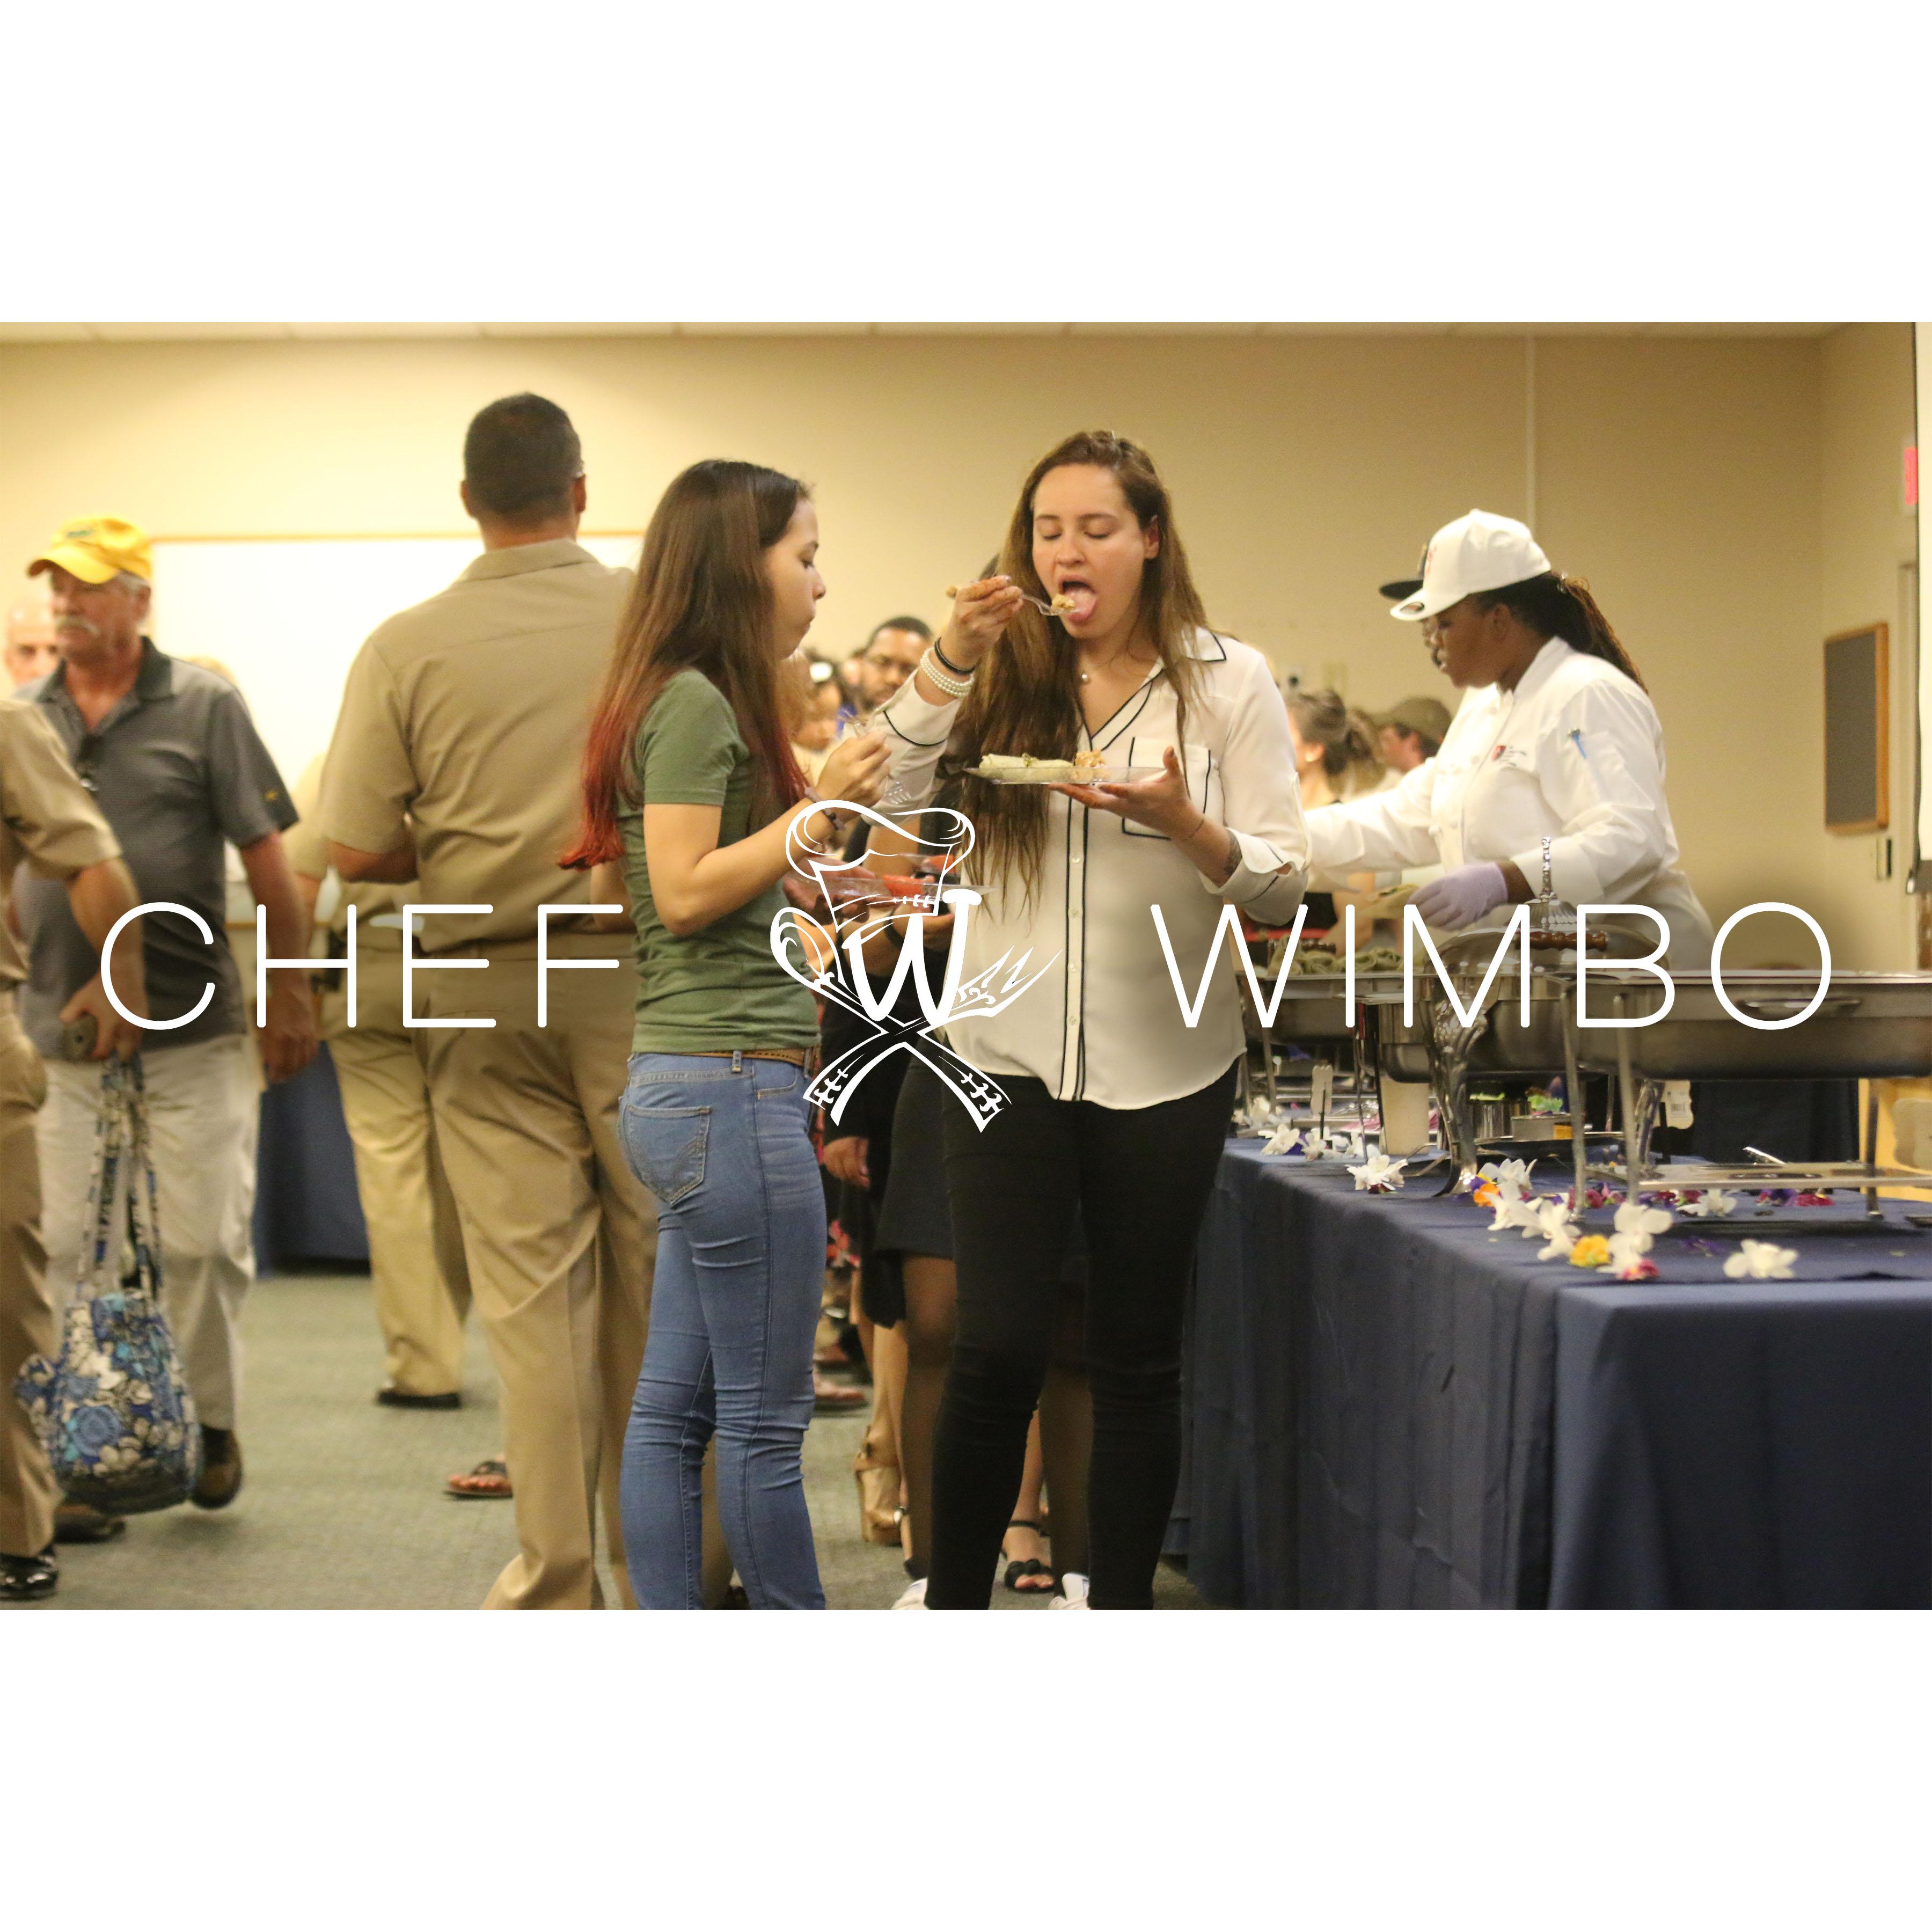 wimbo navy11